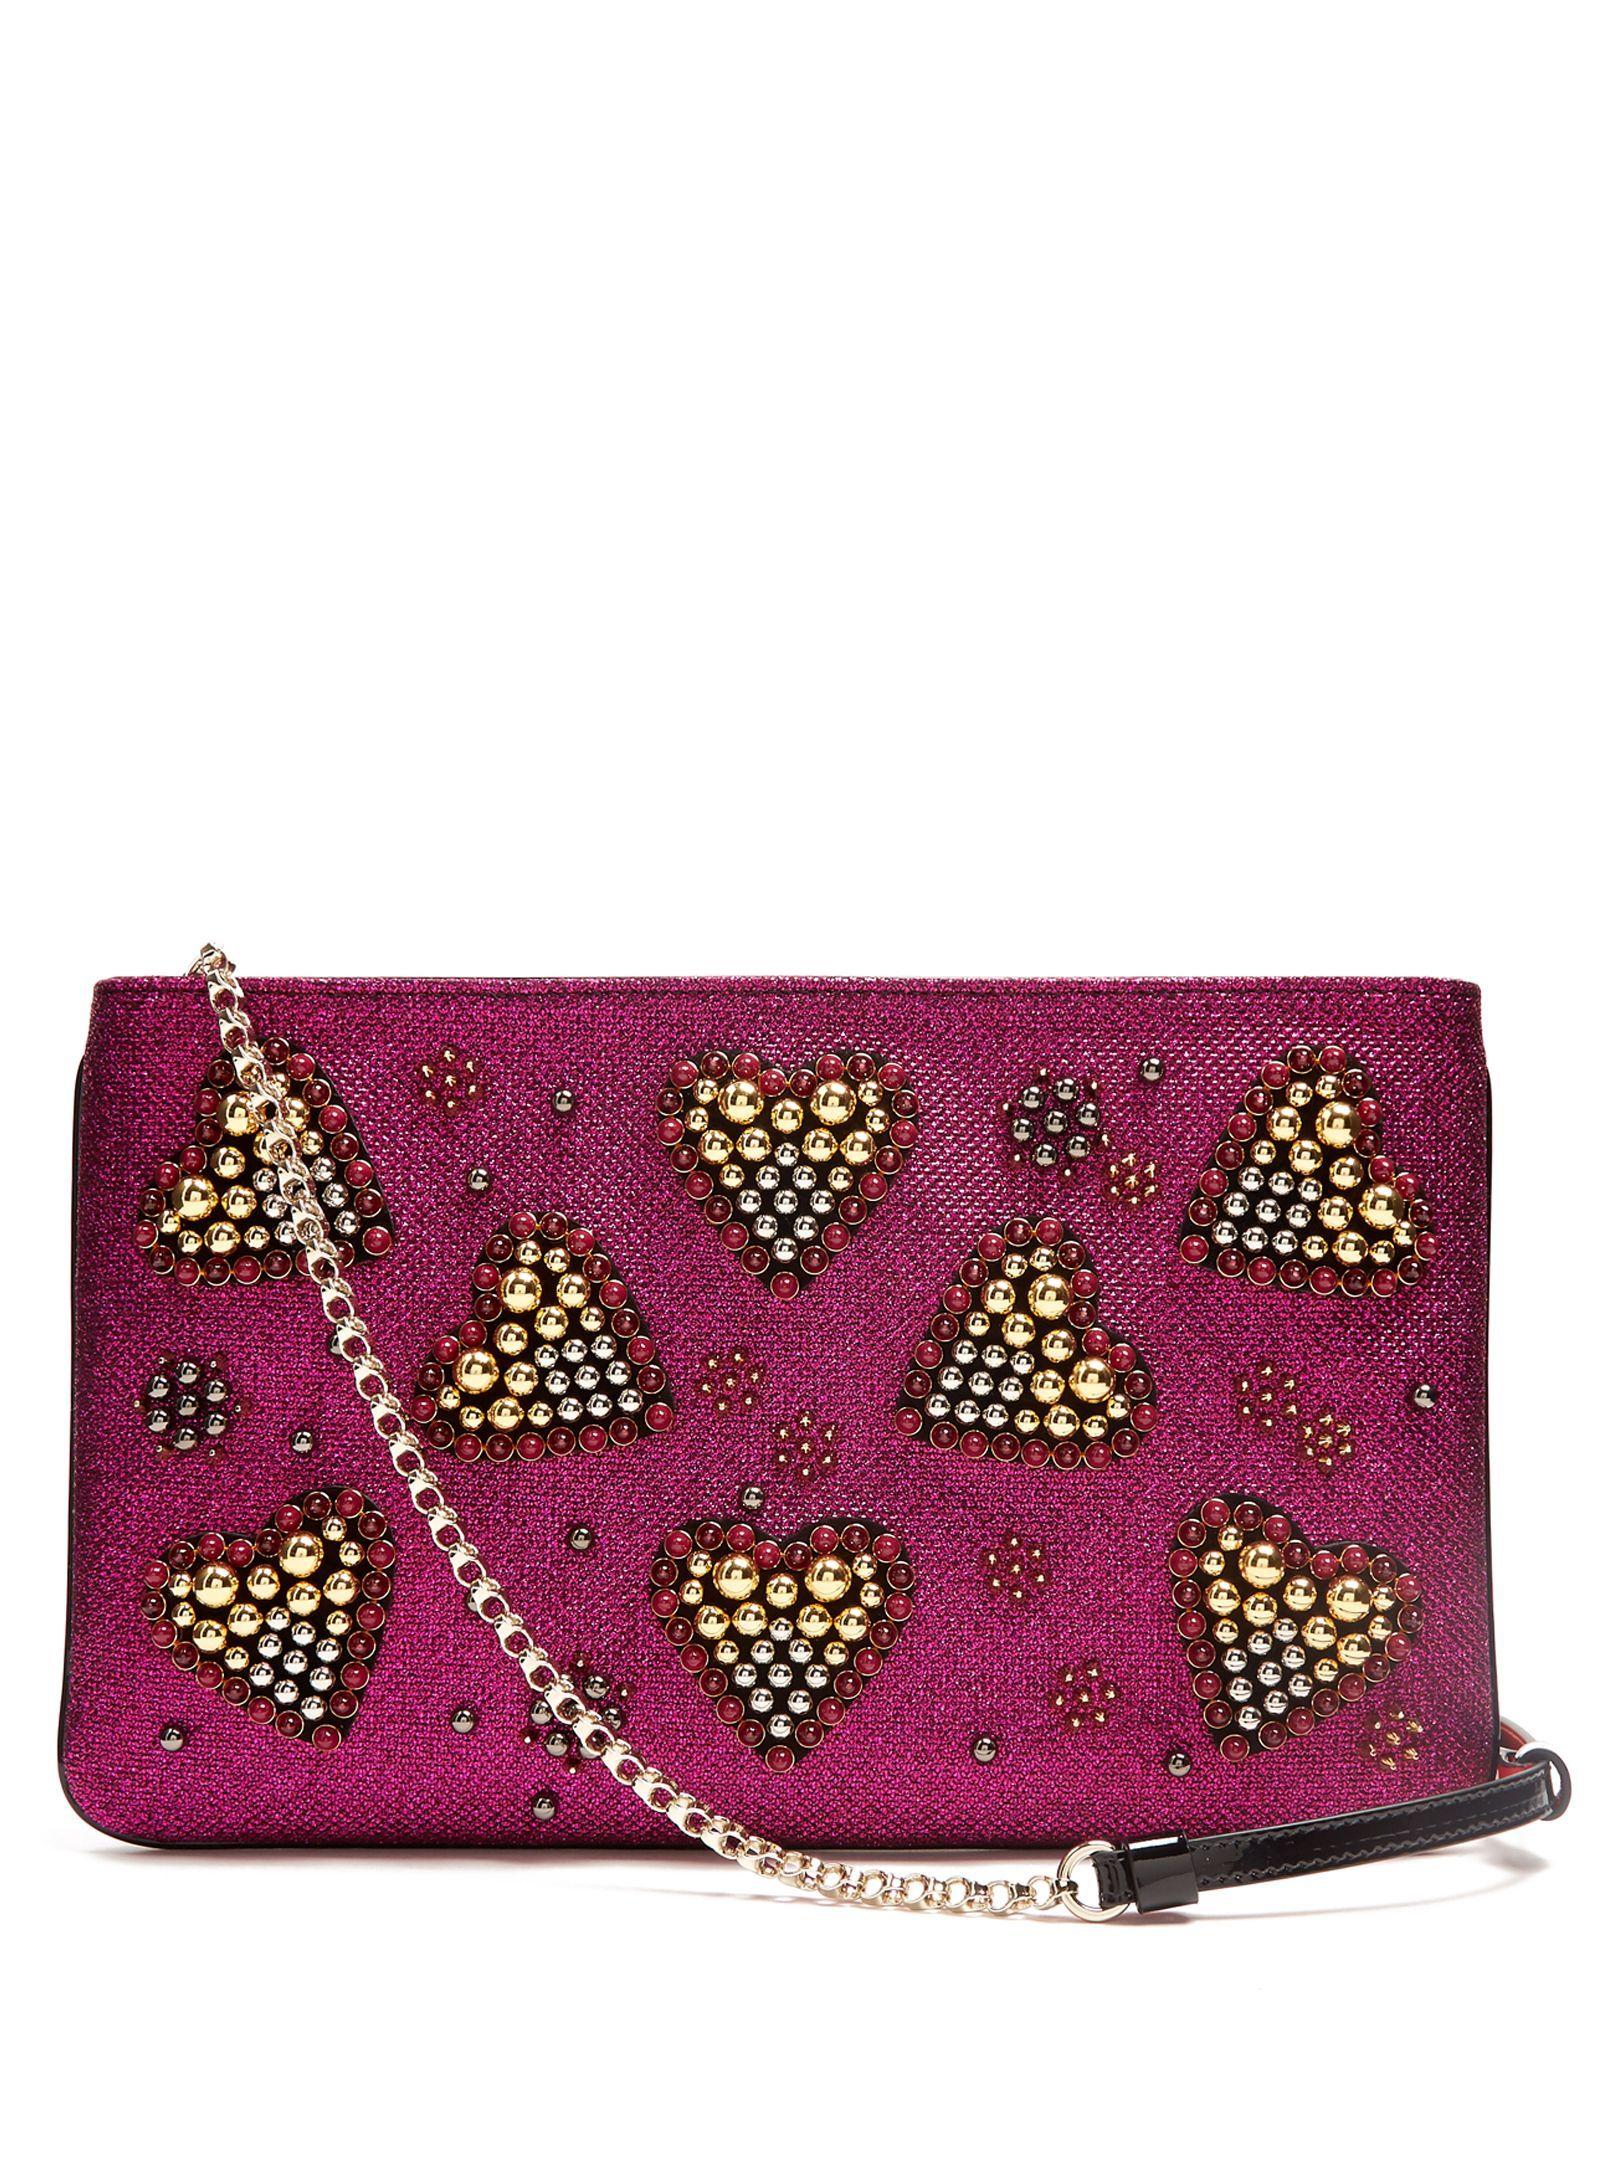 a86778c229b CHRISTIAN LOUBOUTIN Loubiposh spike-embellished glitter pouch ...